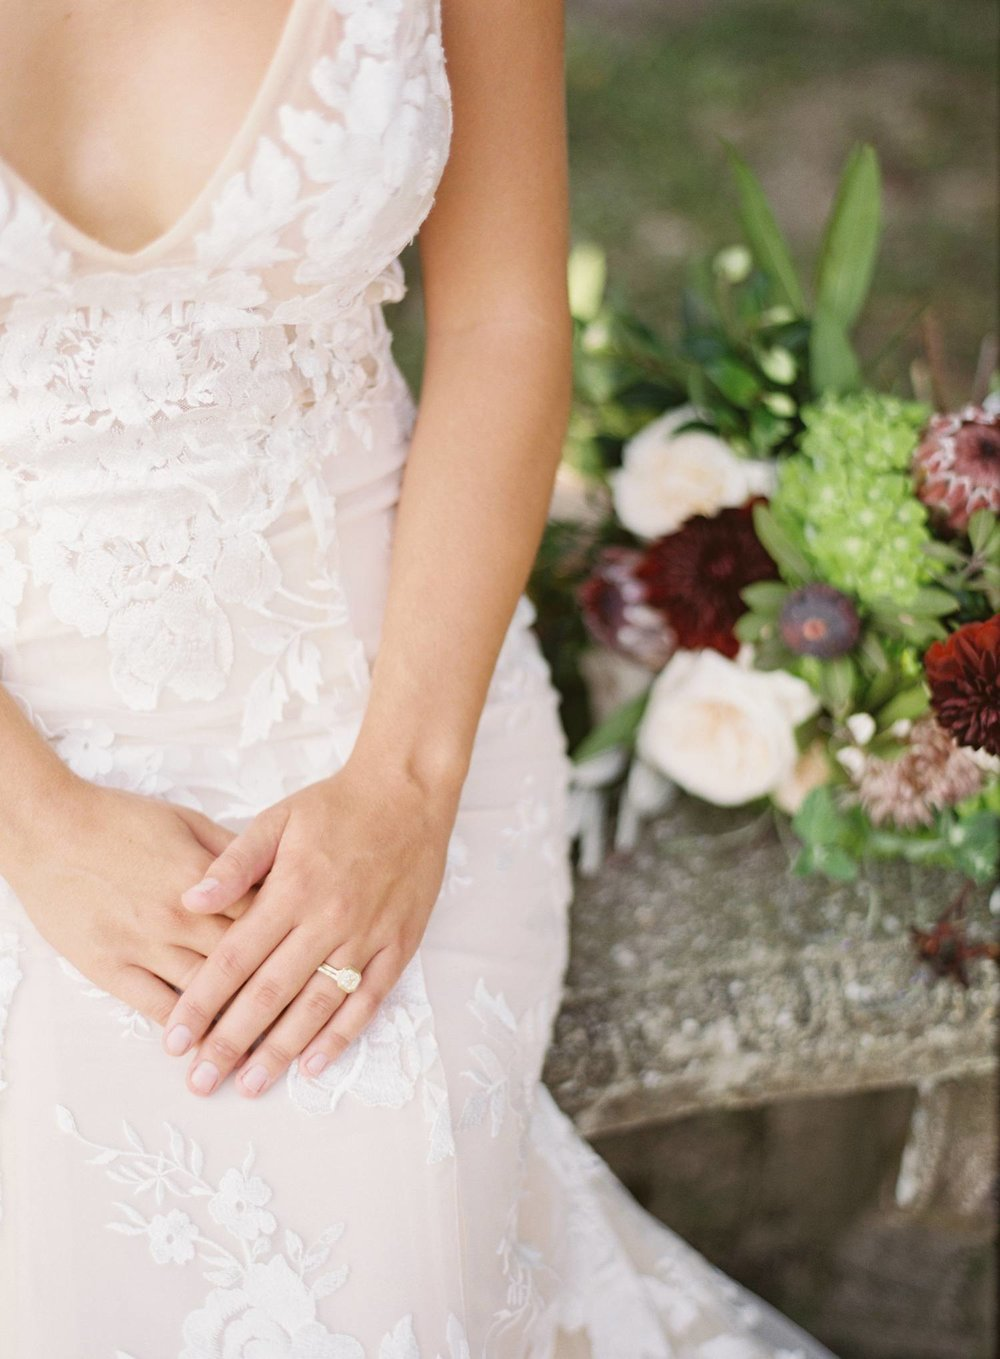 boonehallplantation_wedding_10.jpg